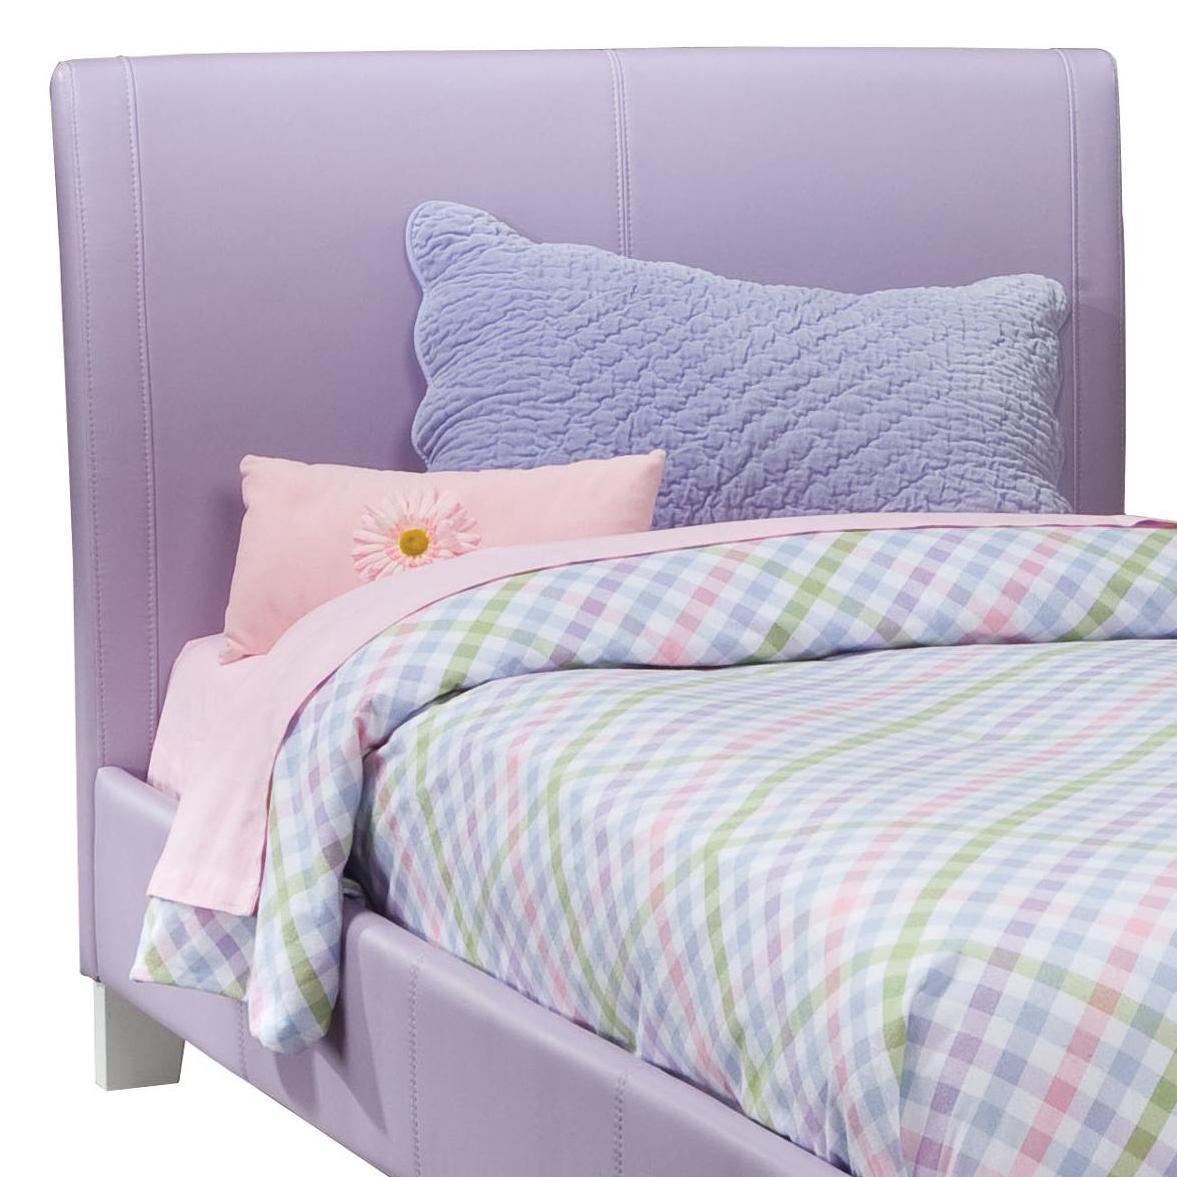 Standard Furniture Fantasia Full Upholstered Headboard - Item Number: 60772